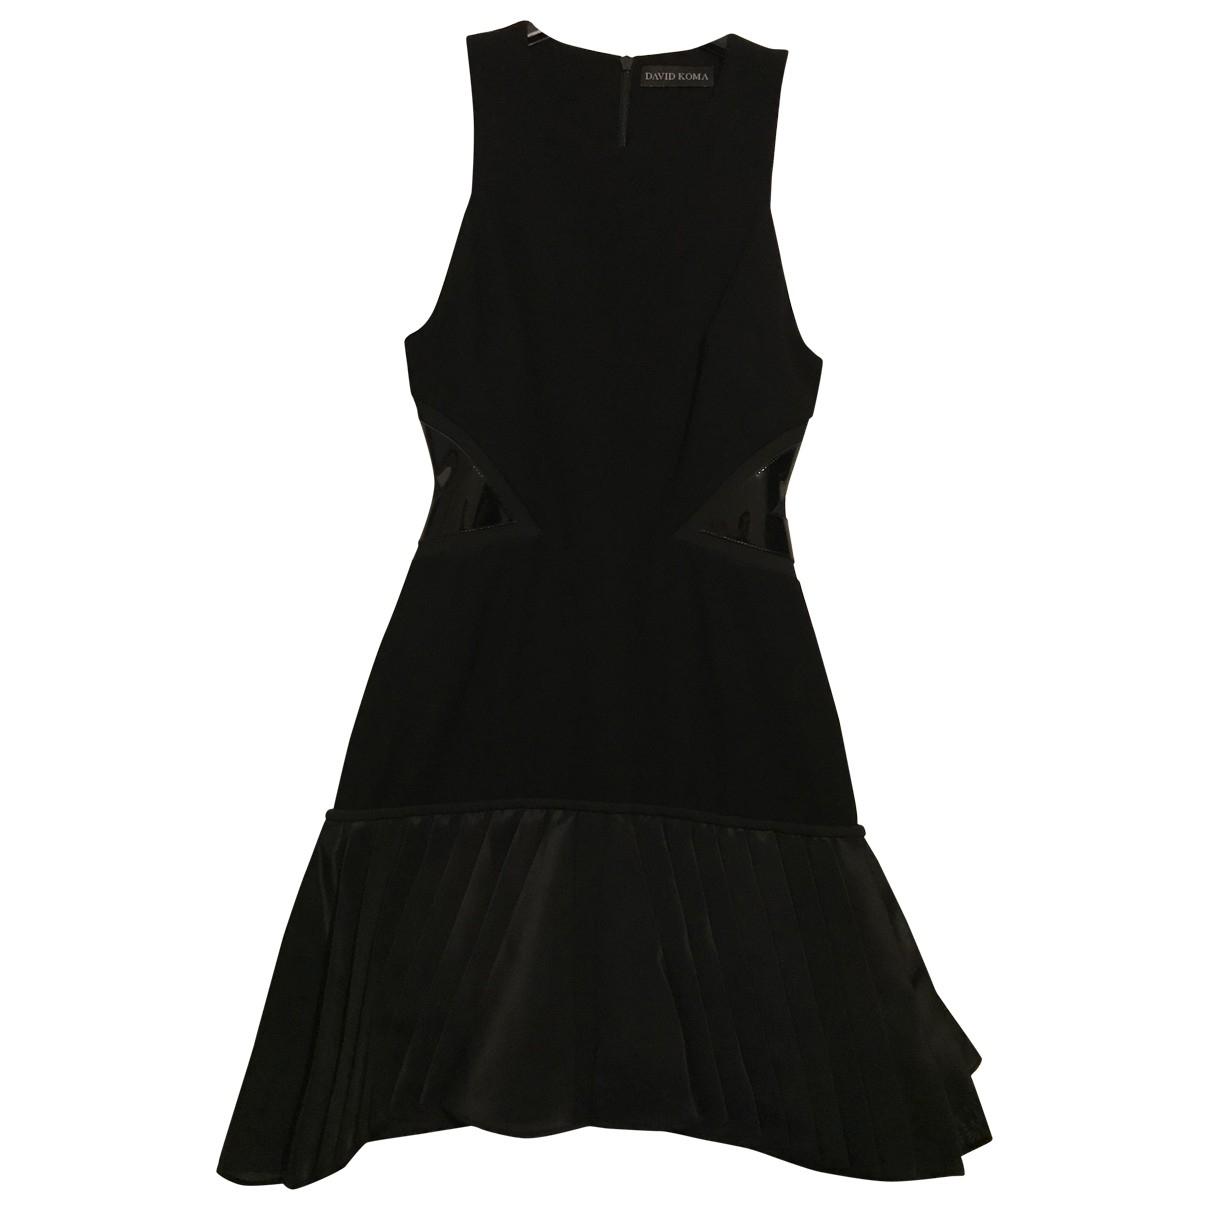 David Koma \N Kleid in  Schwarz Seide